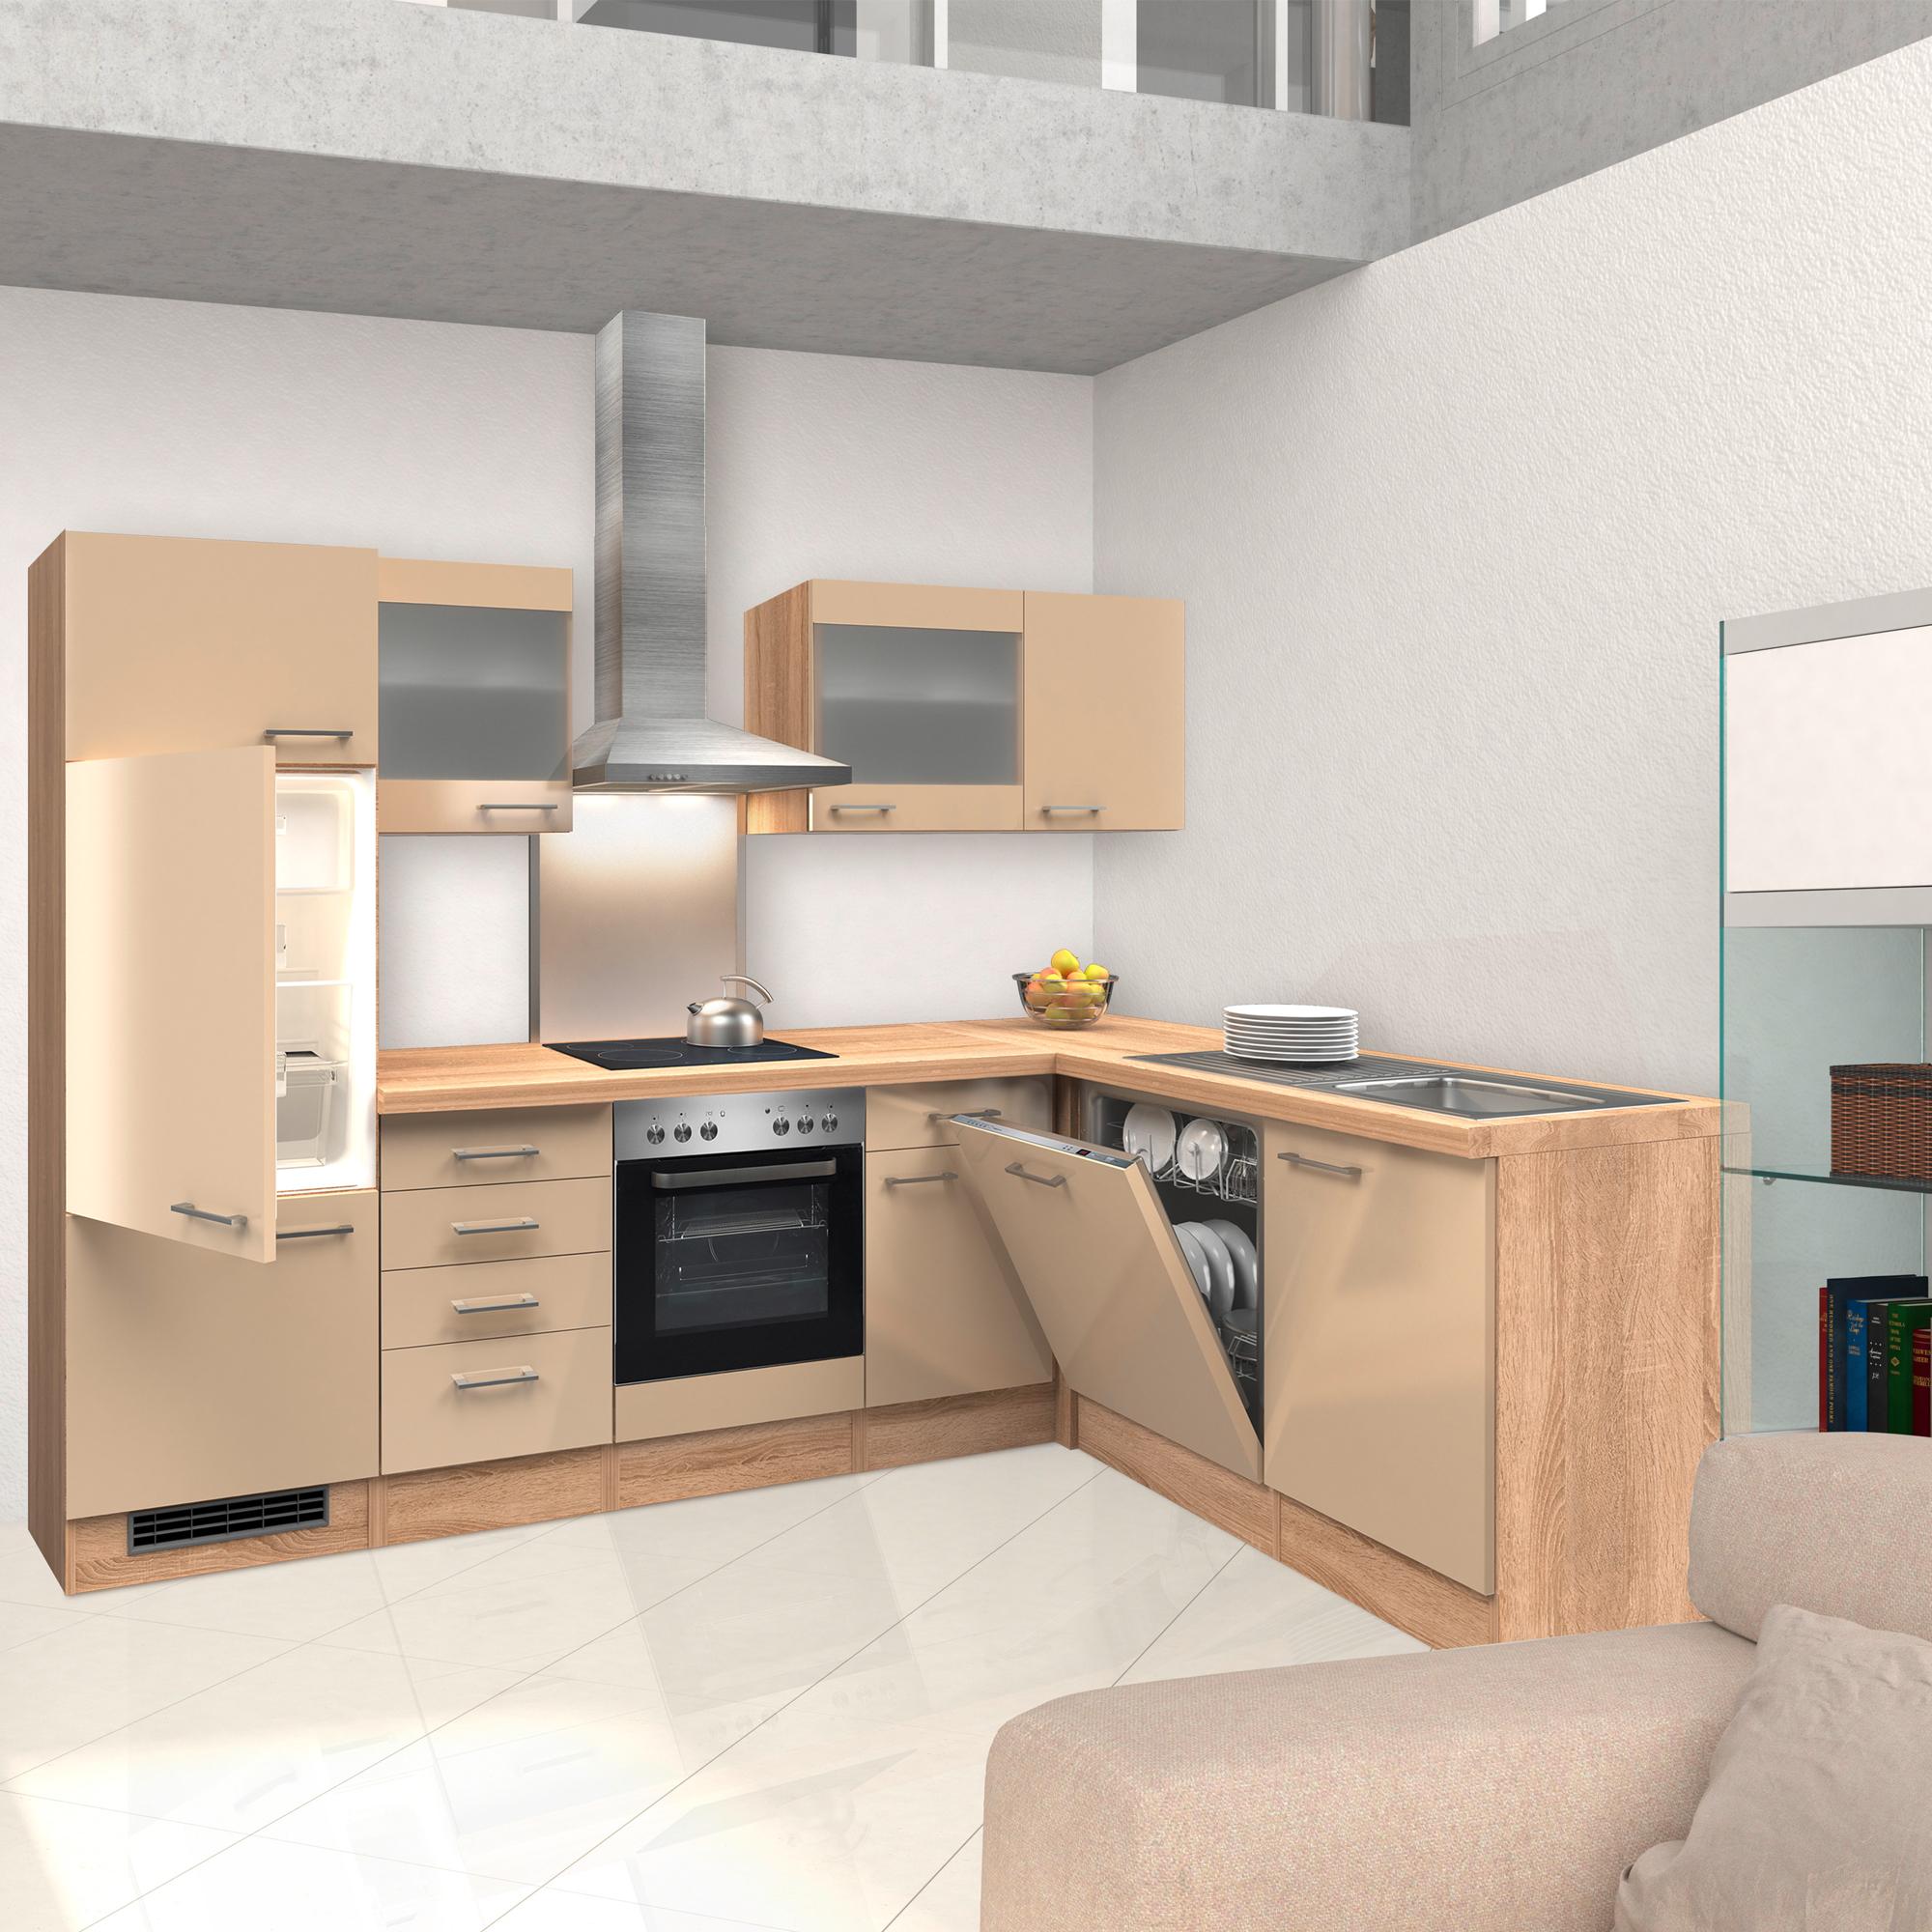 eckk che nepal mit e ger ten 2 glash nger breite 280 x 170 cm creme k che k chenzeilen. Black Bedroom Furniture Sets. Home Design Ideas